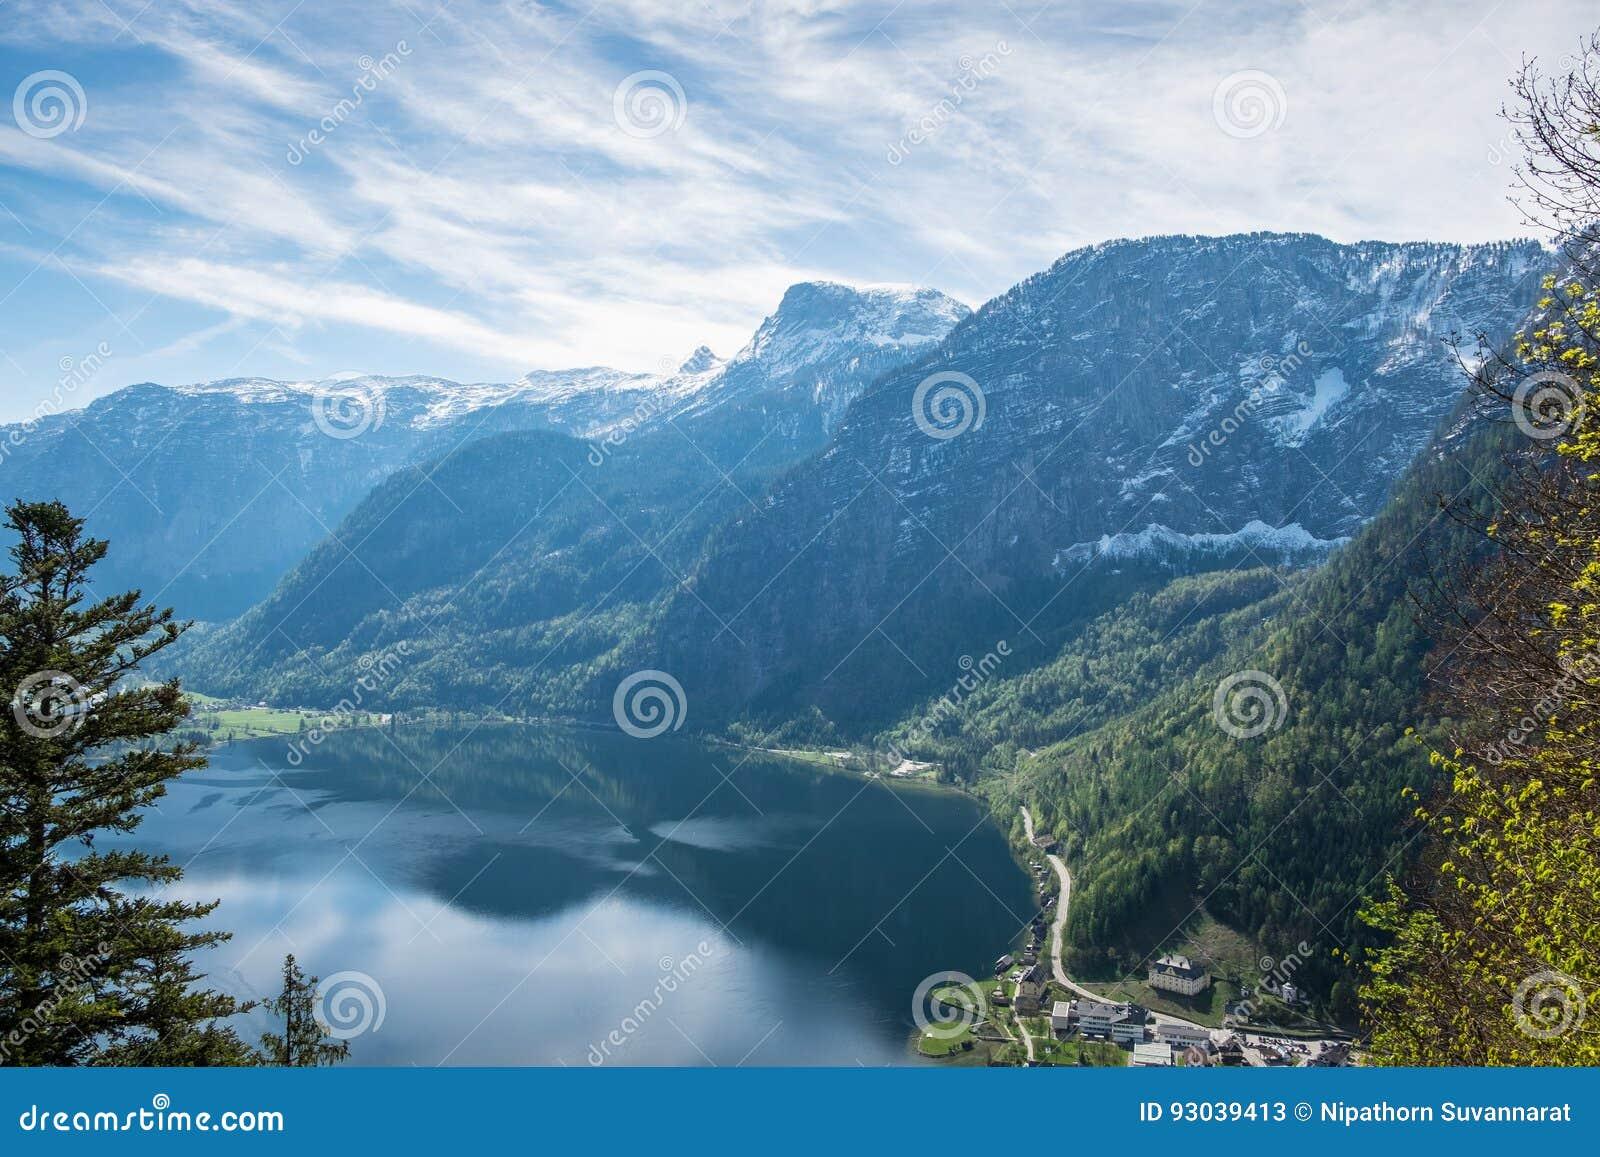 Aerial View is hallstatt city background mountain Alps